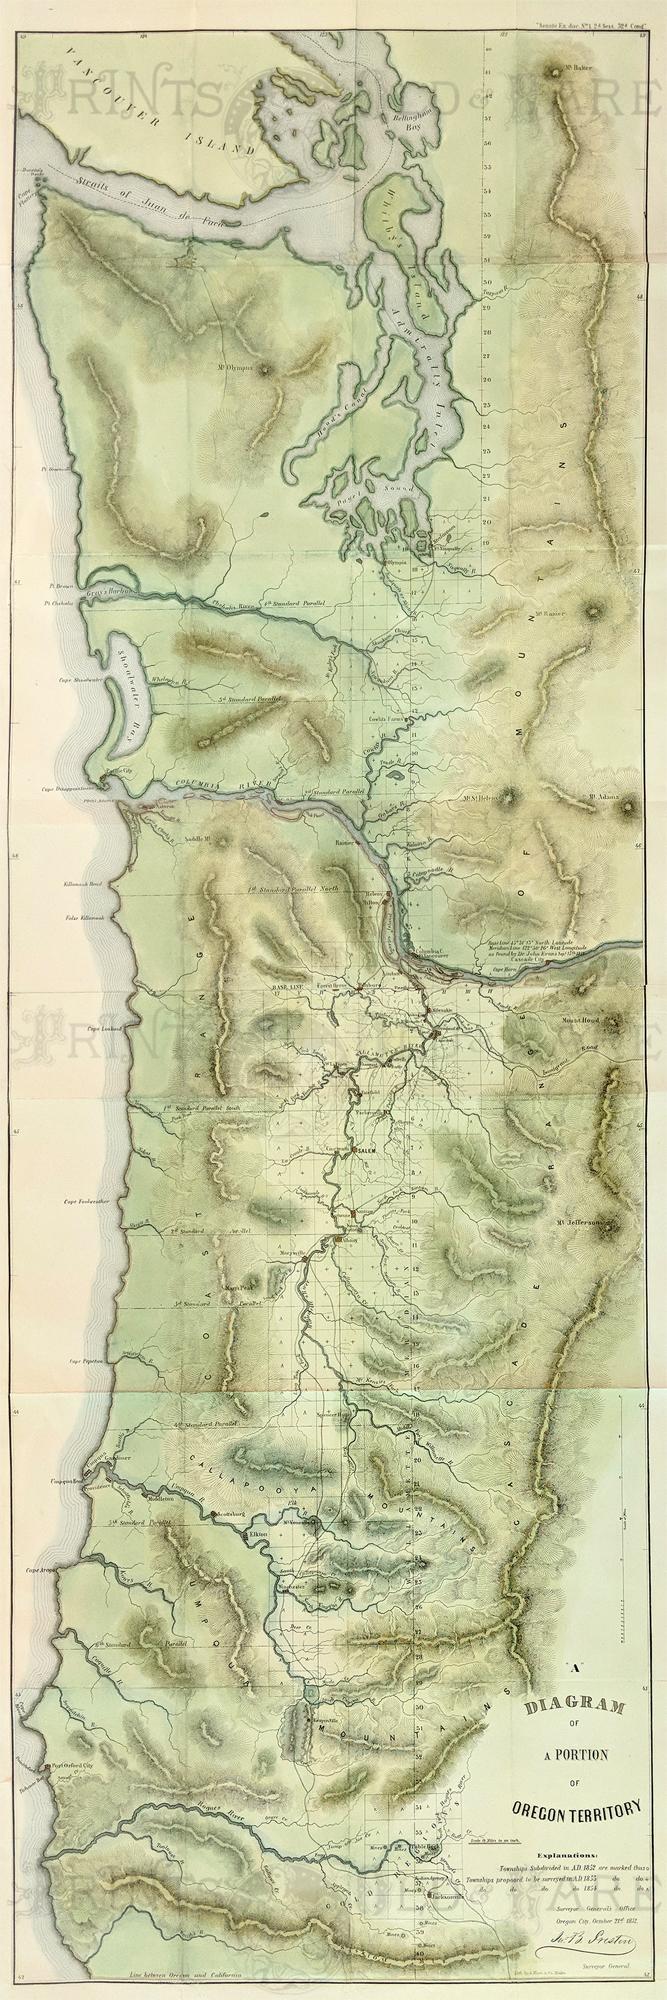 Picture of: Prints Old Rare Washington Antique Maps Prints